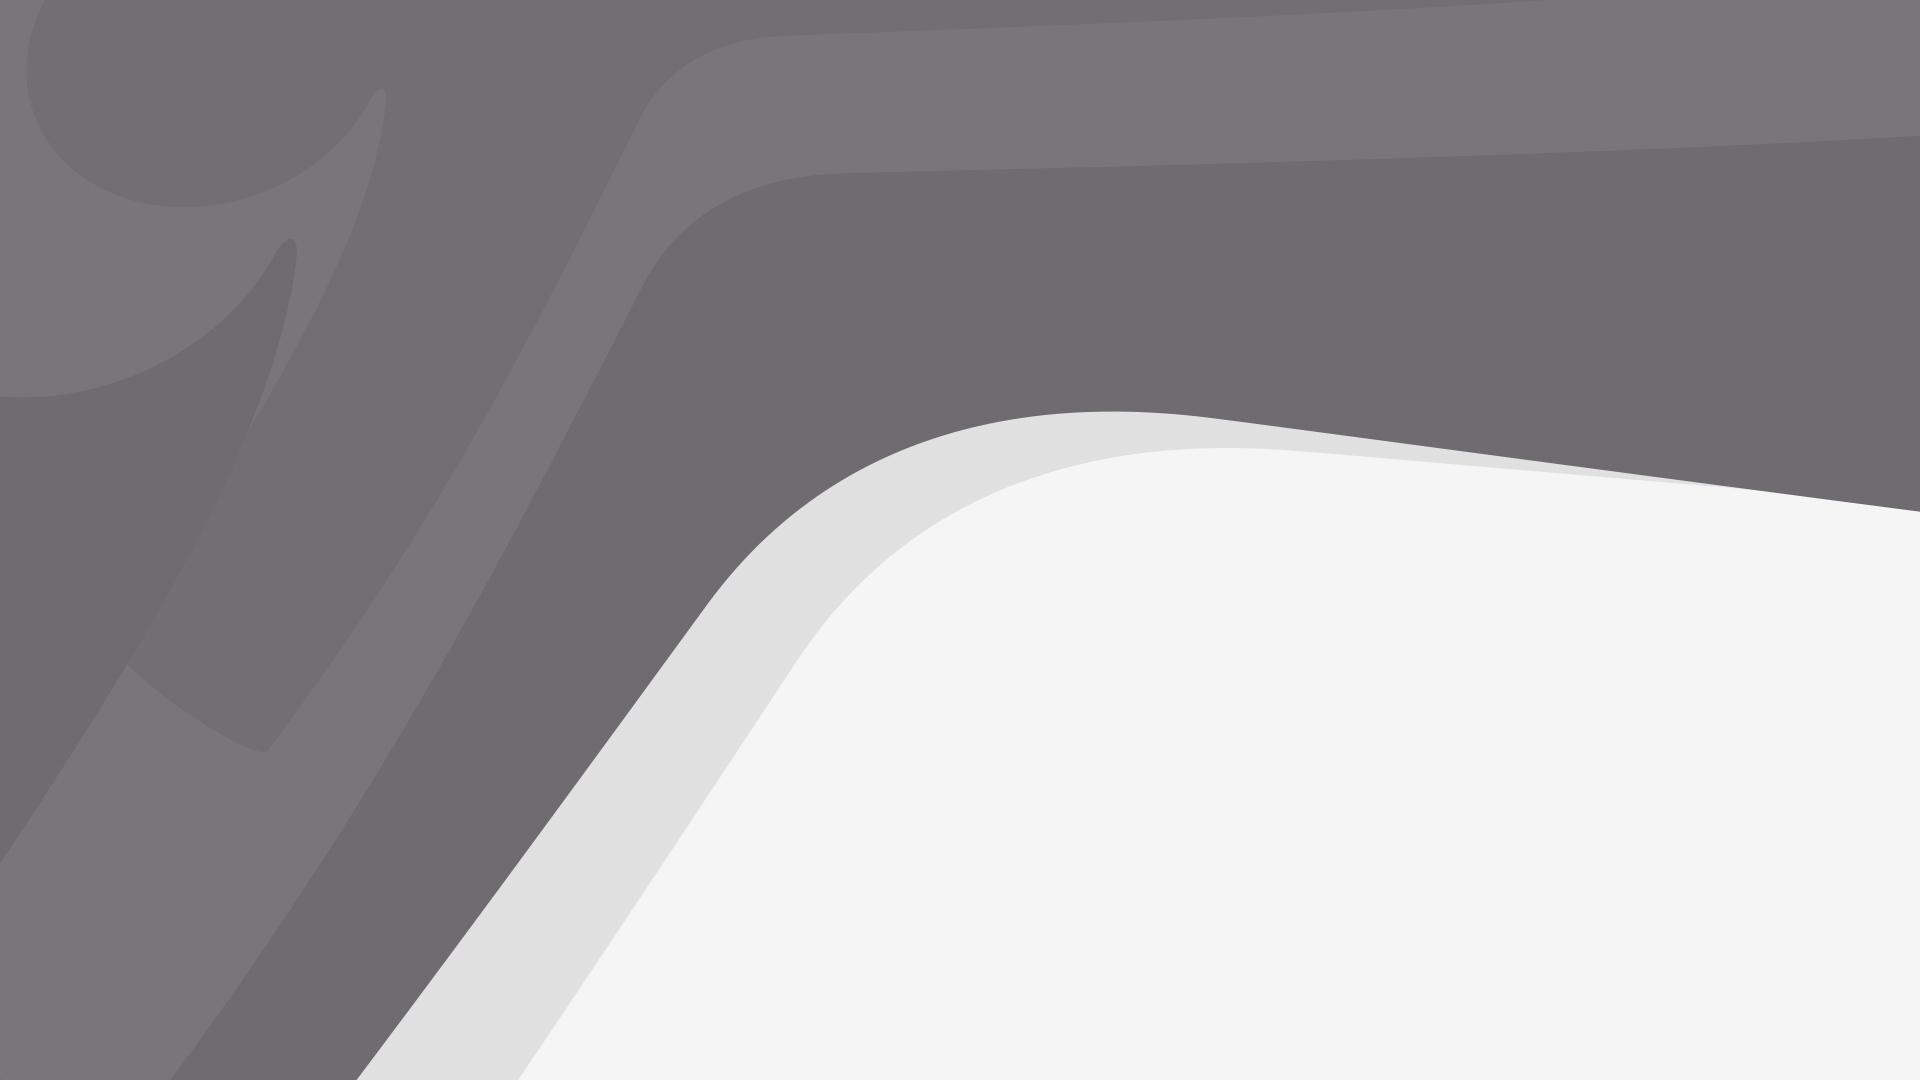 Website design and development / web application design / Graphics Design / Corporate Identity